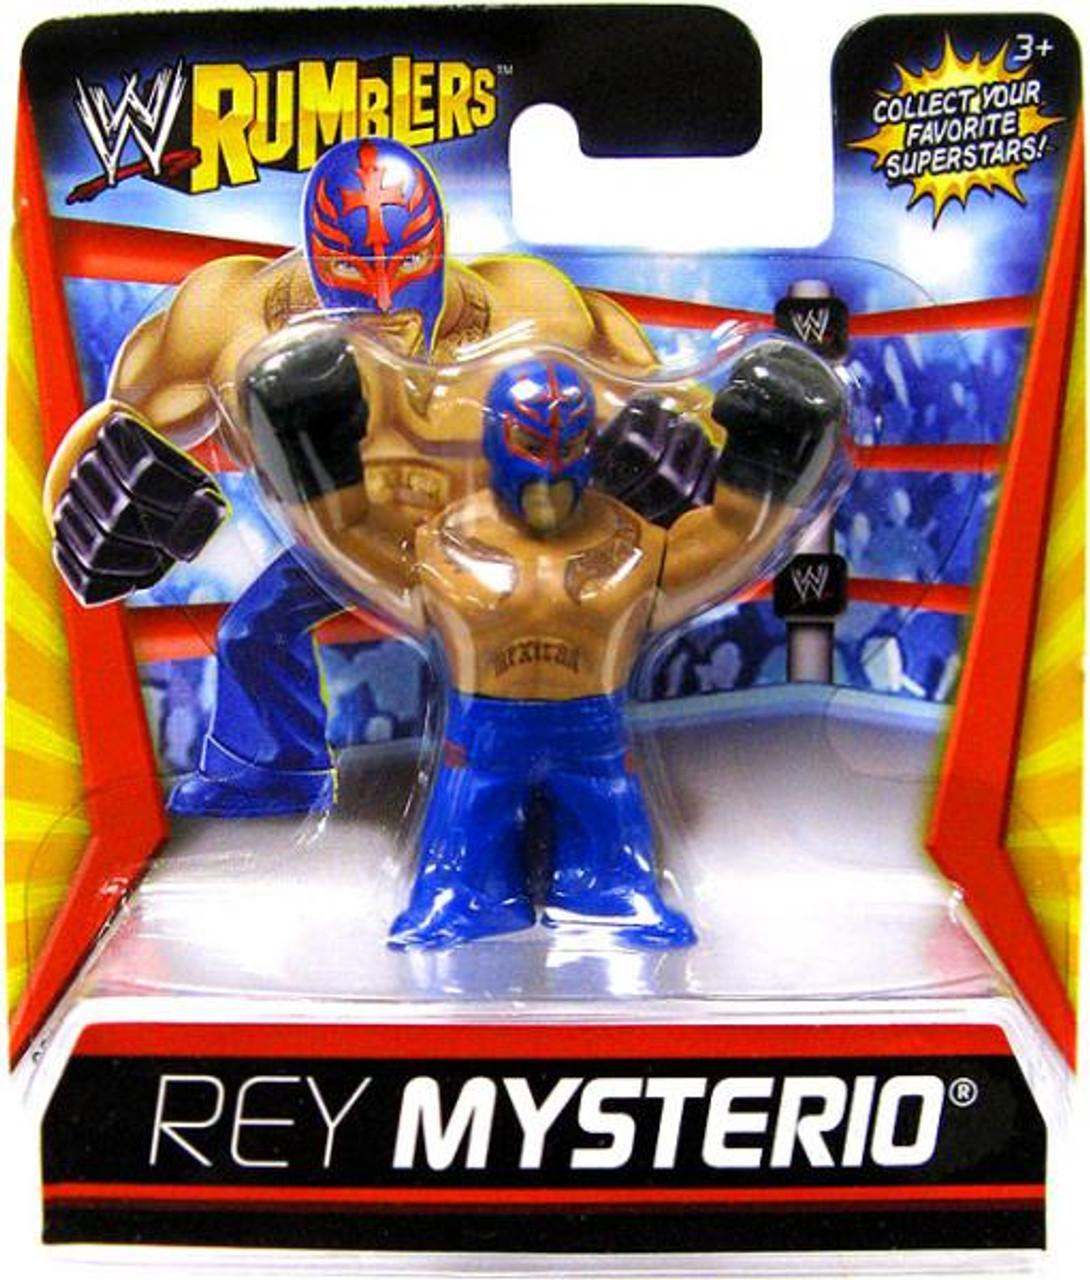 WWE Wrestling Rumblers Series 1 Rey Mysterio Mini Figure [Blue Outfit]